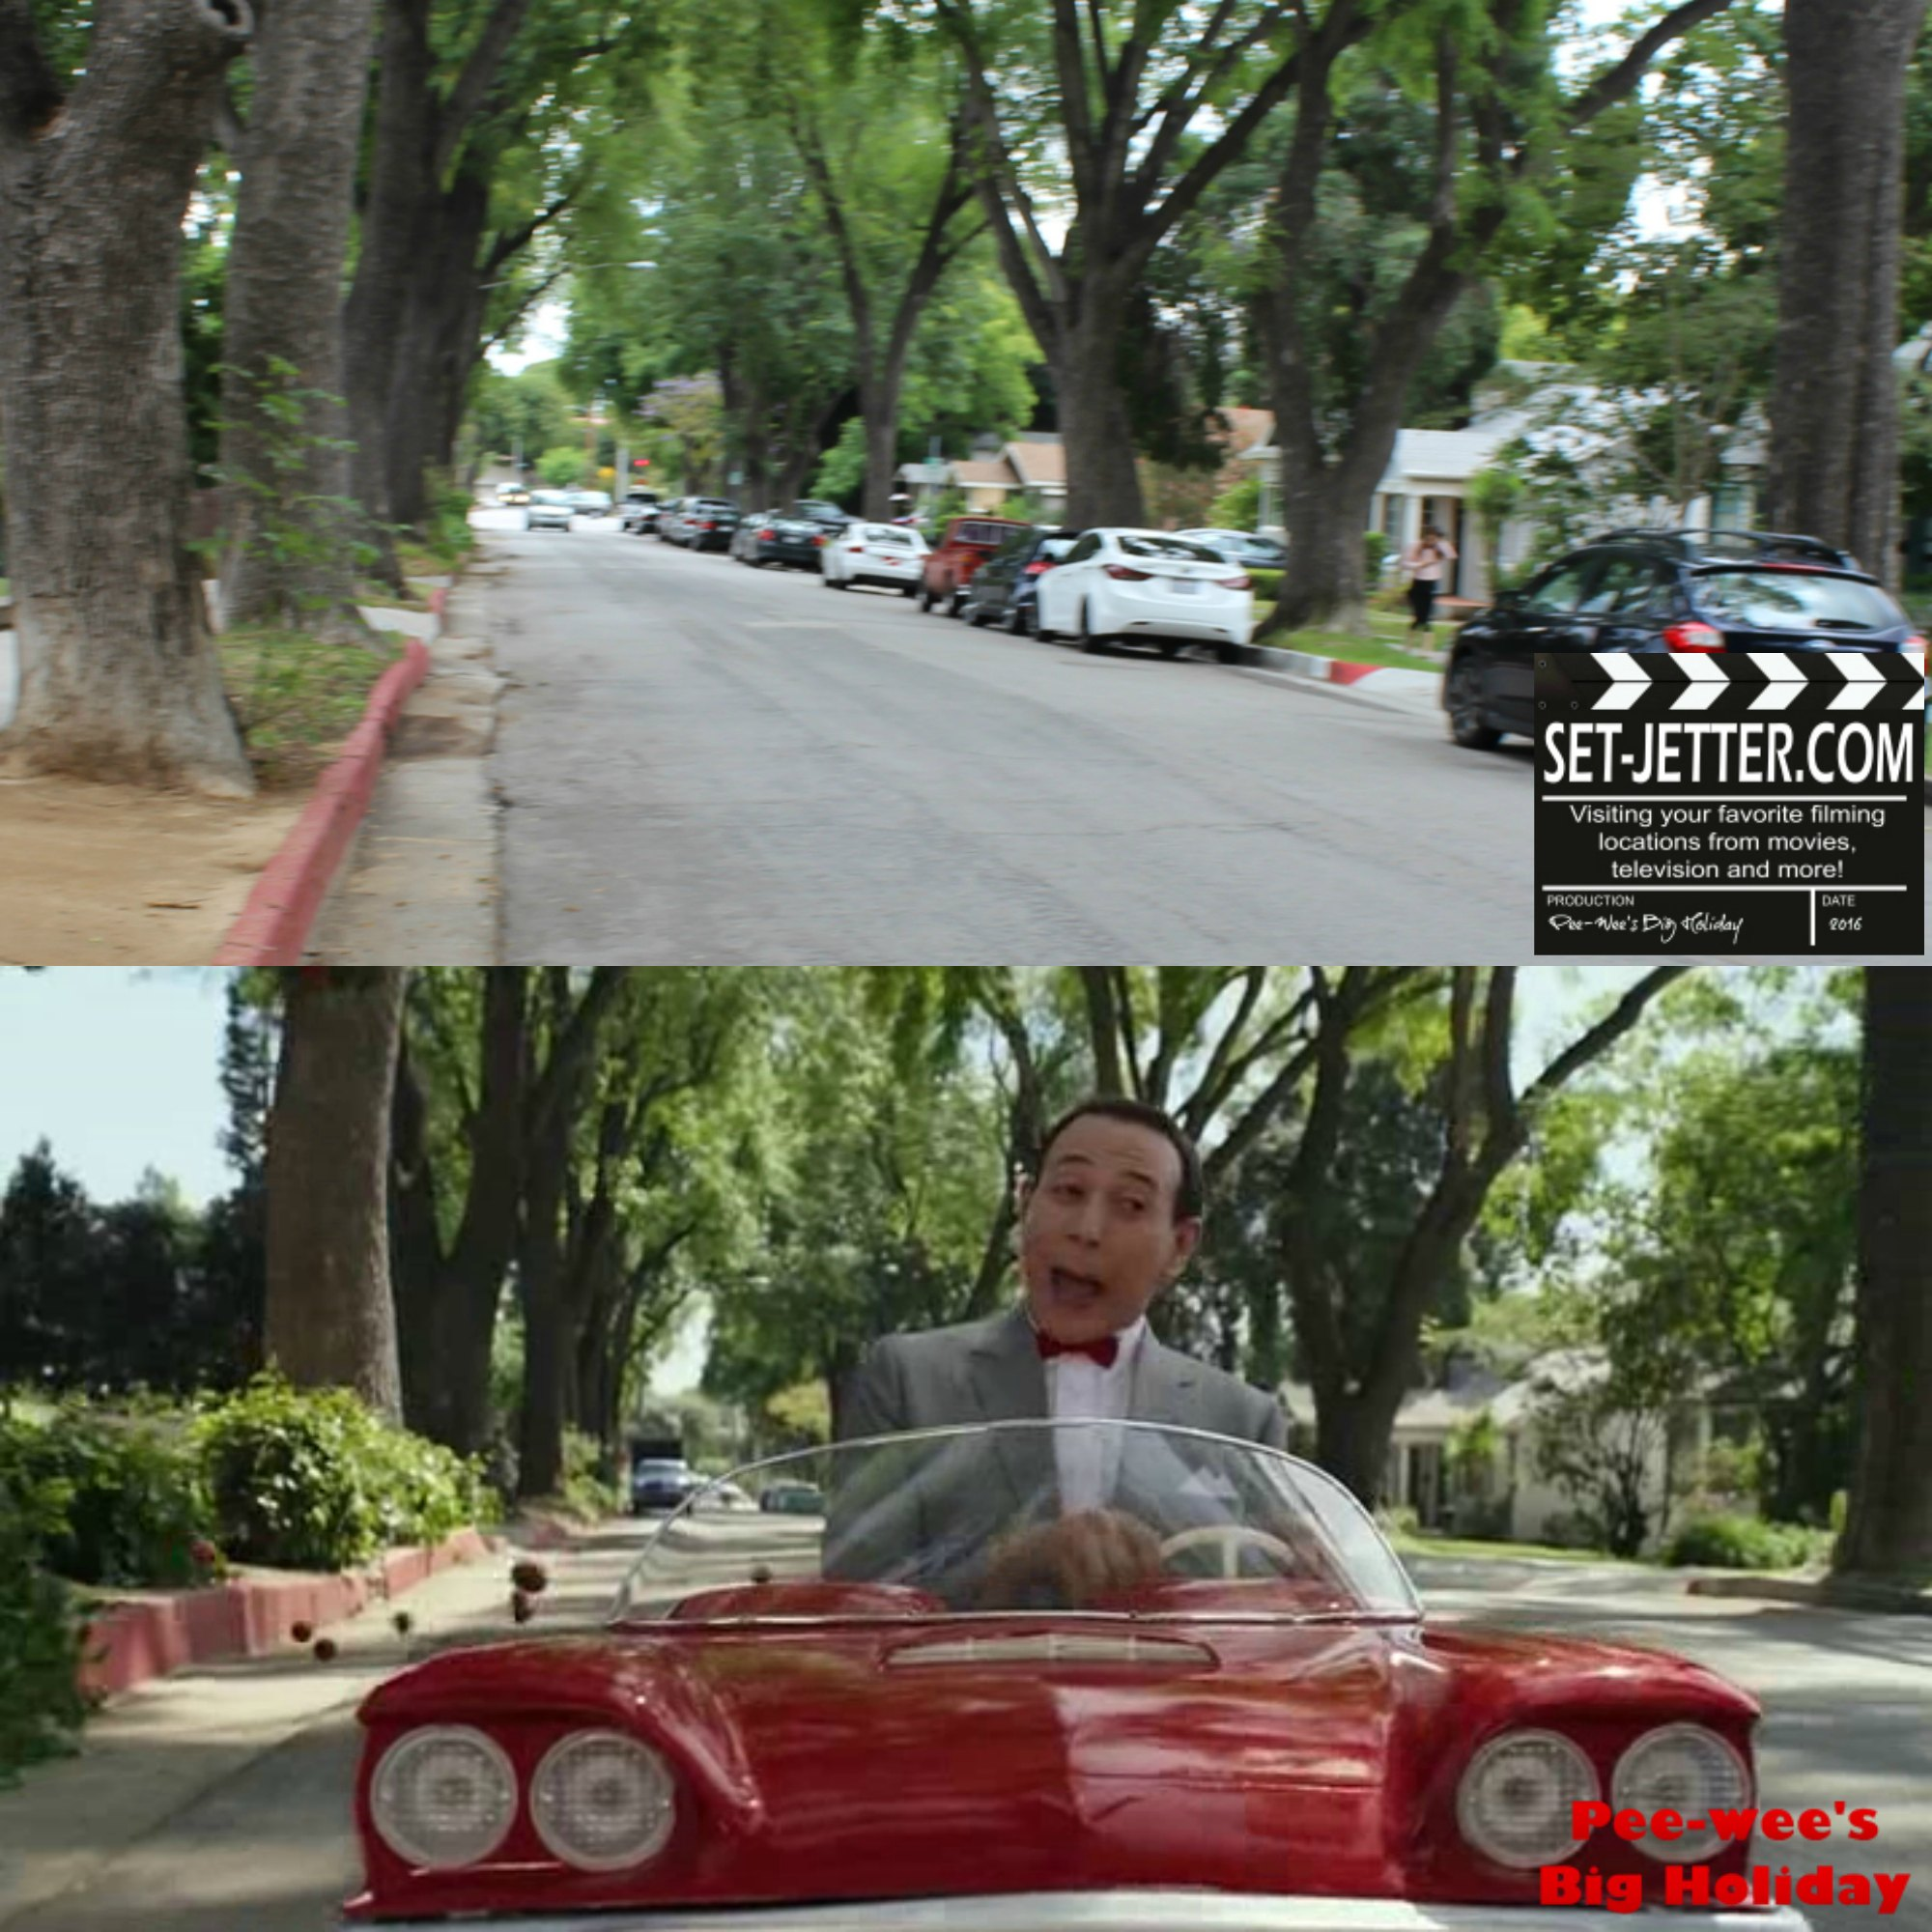 Pee Wee's Big Holiday comparison 203.jpg